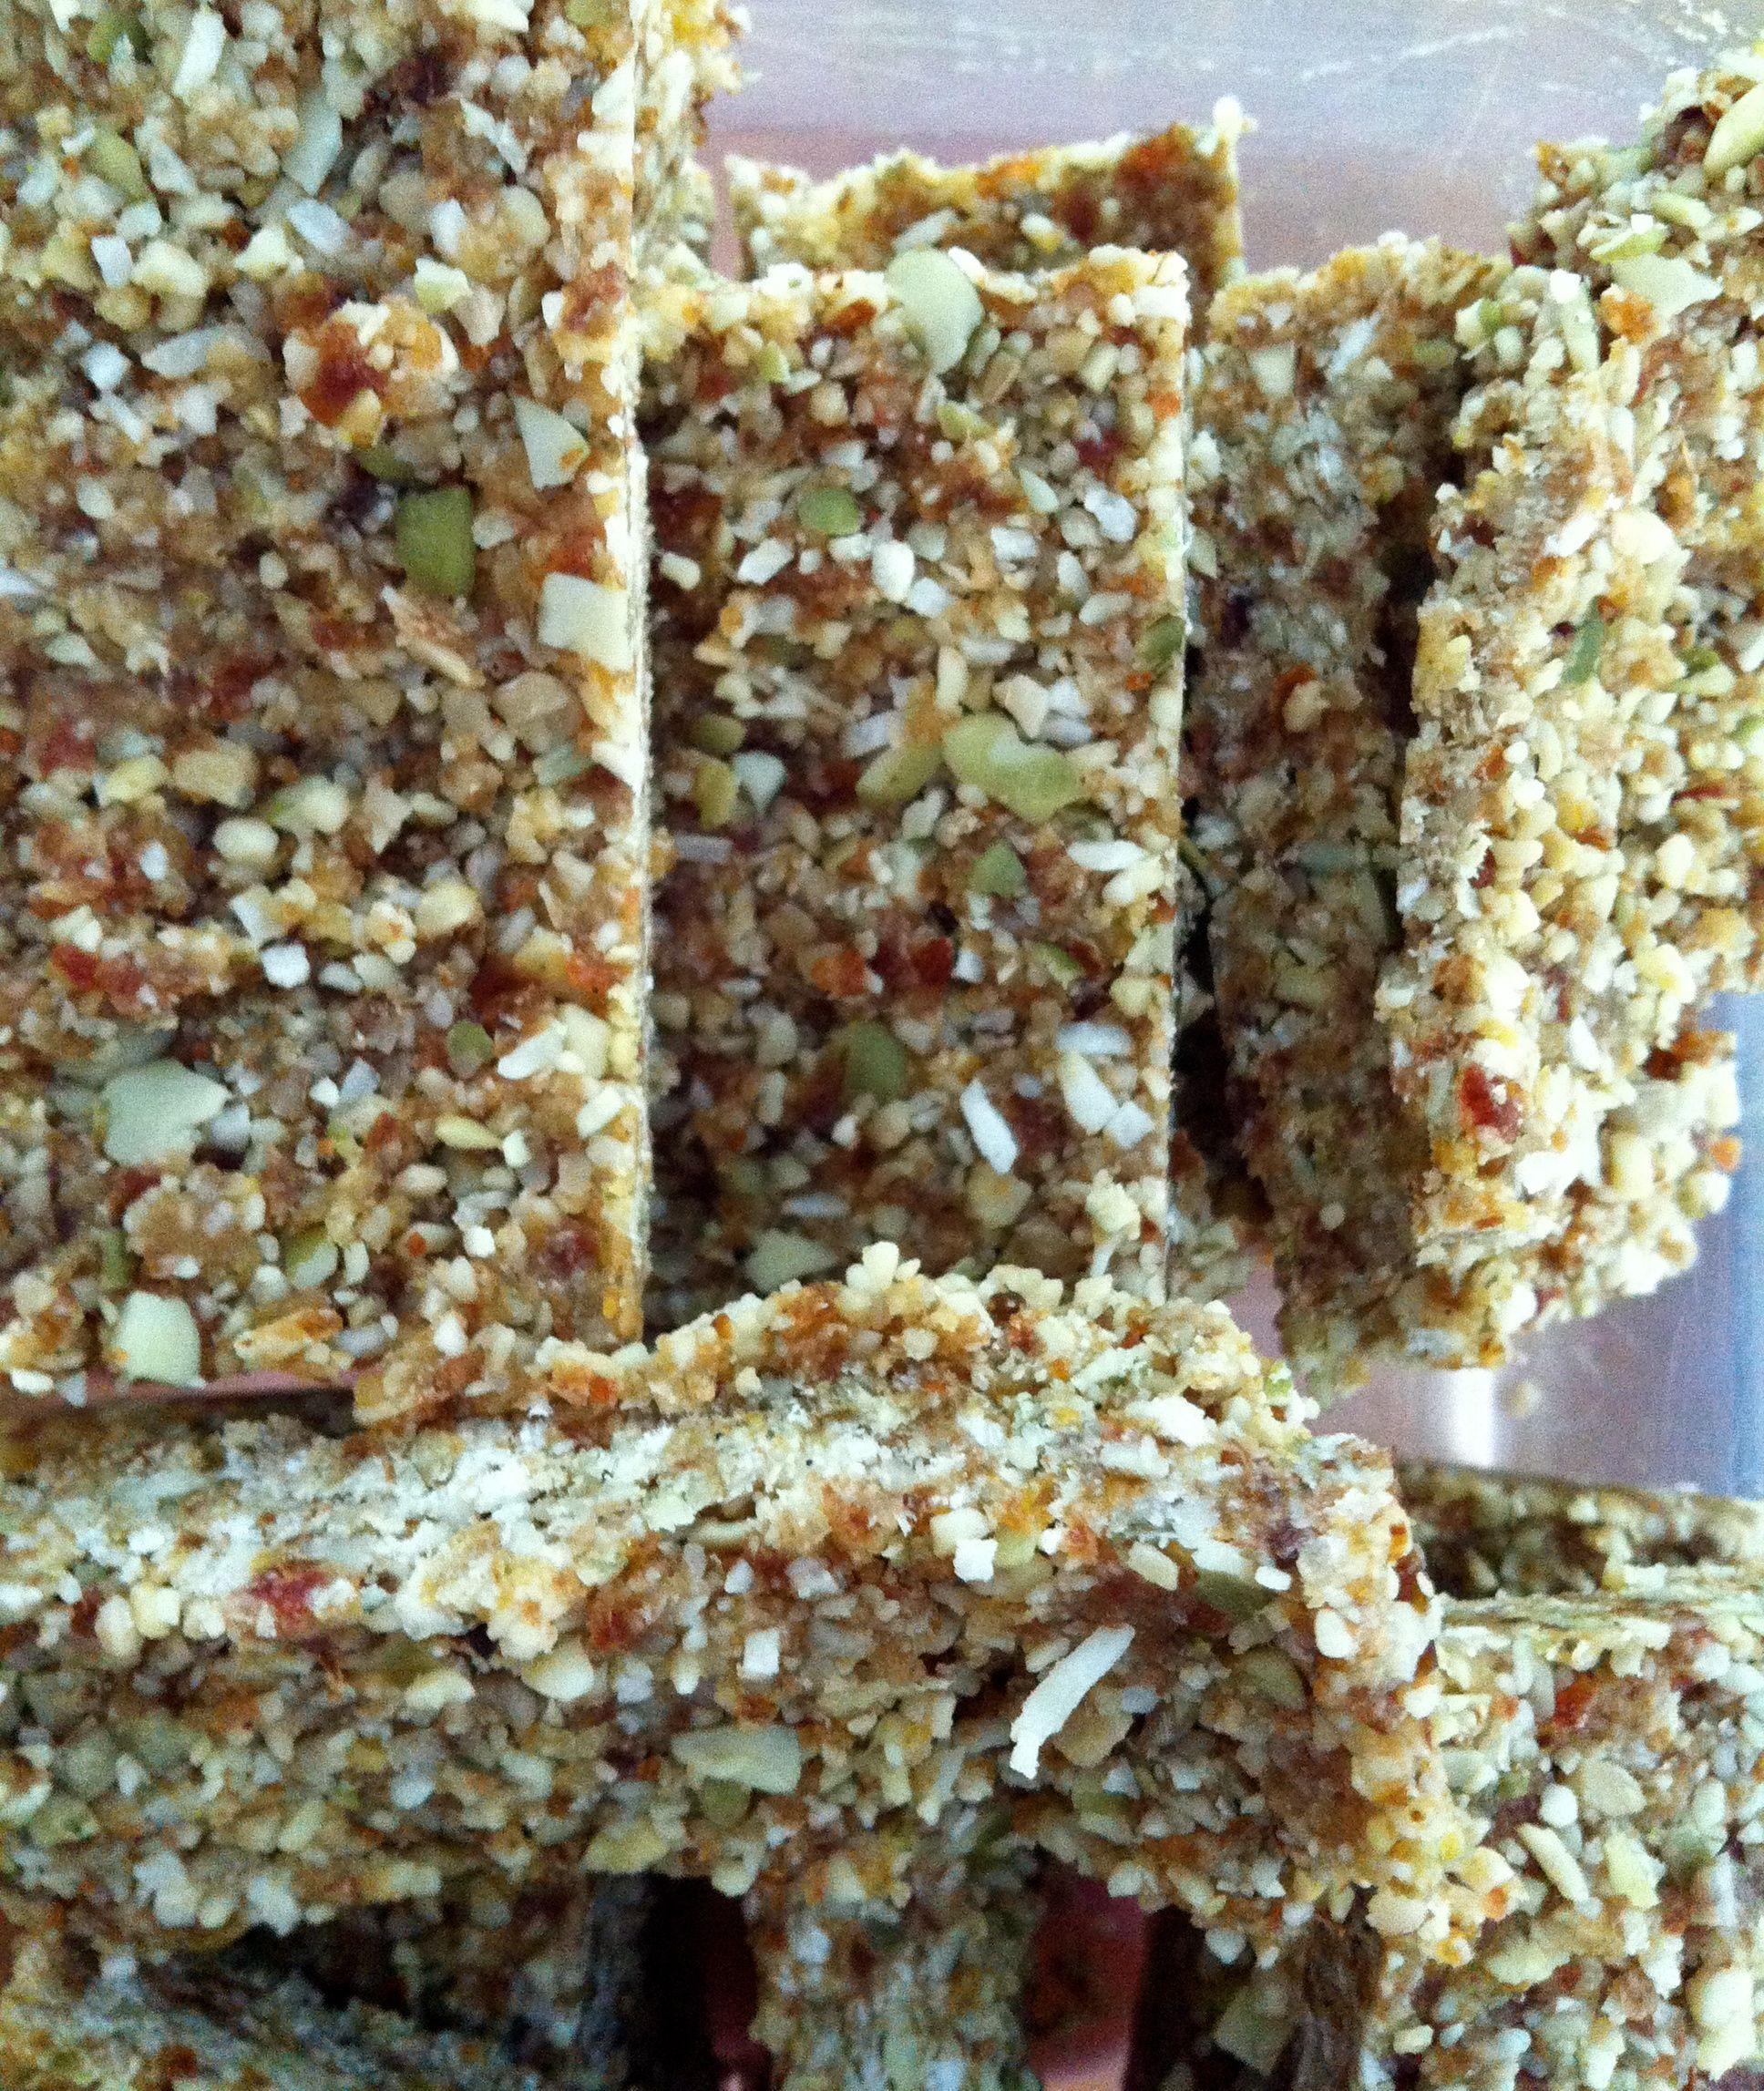 Snack Attack Raw Bar Gluten Dairy Egg Free Raw Snacks Muesli Bar Recipe Raw Food Recipes